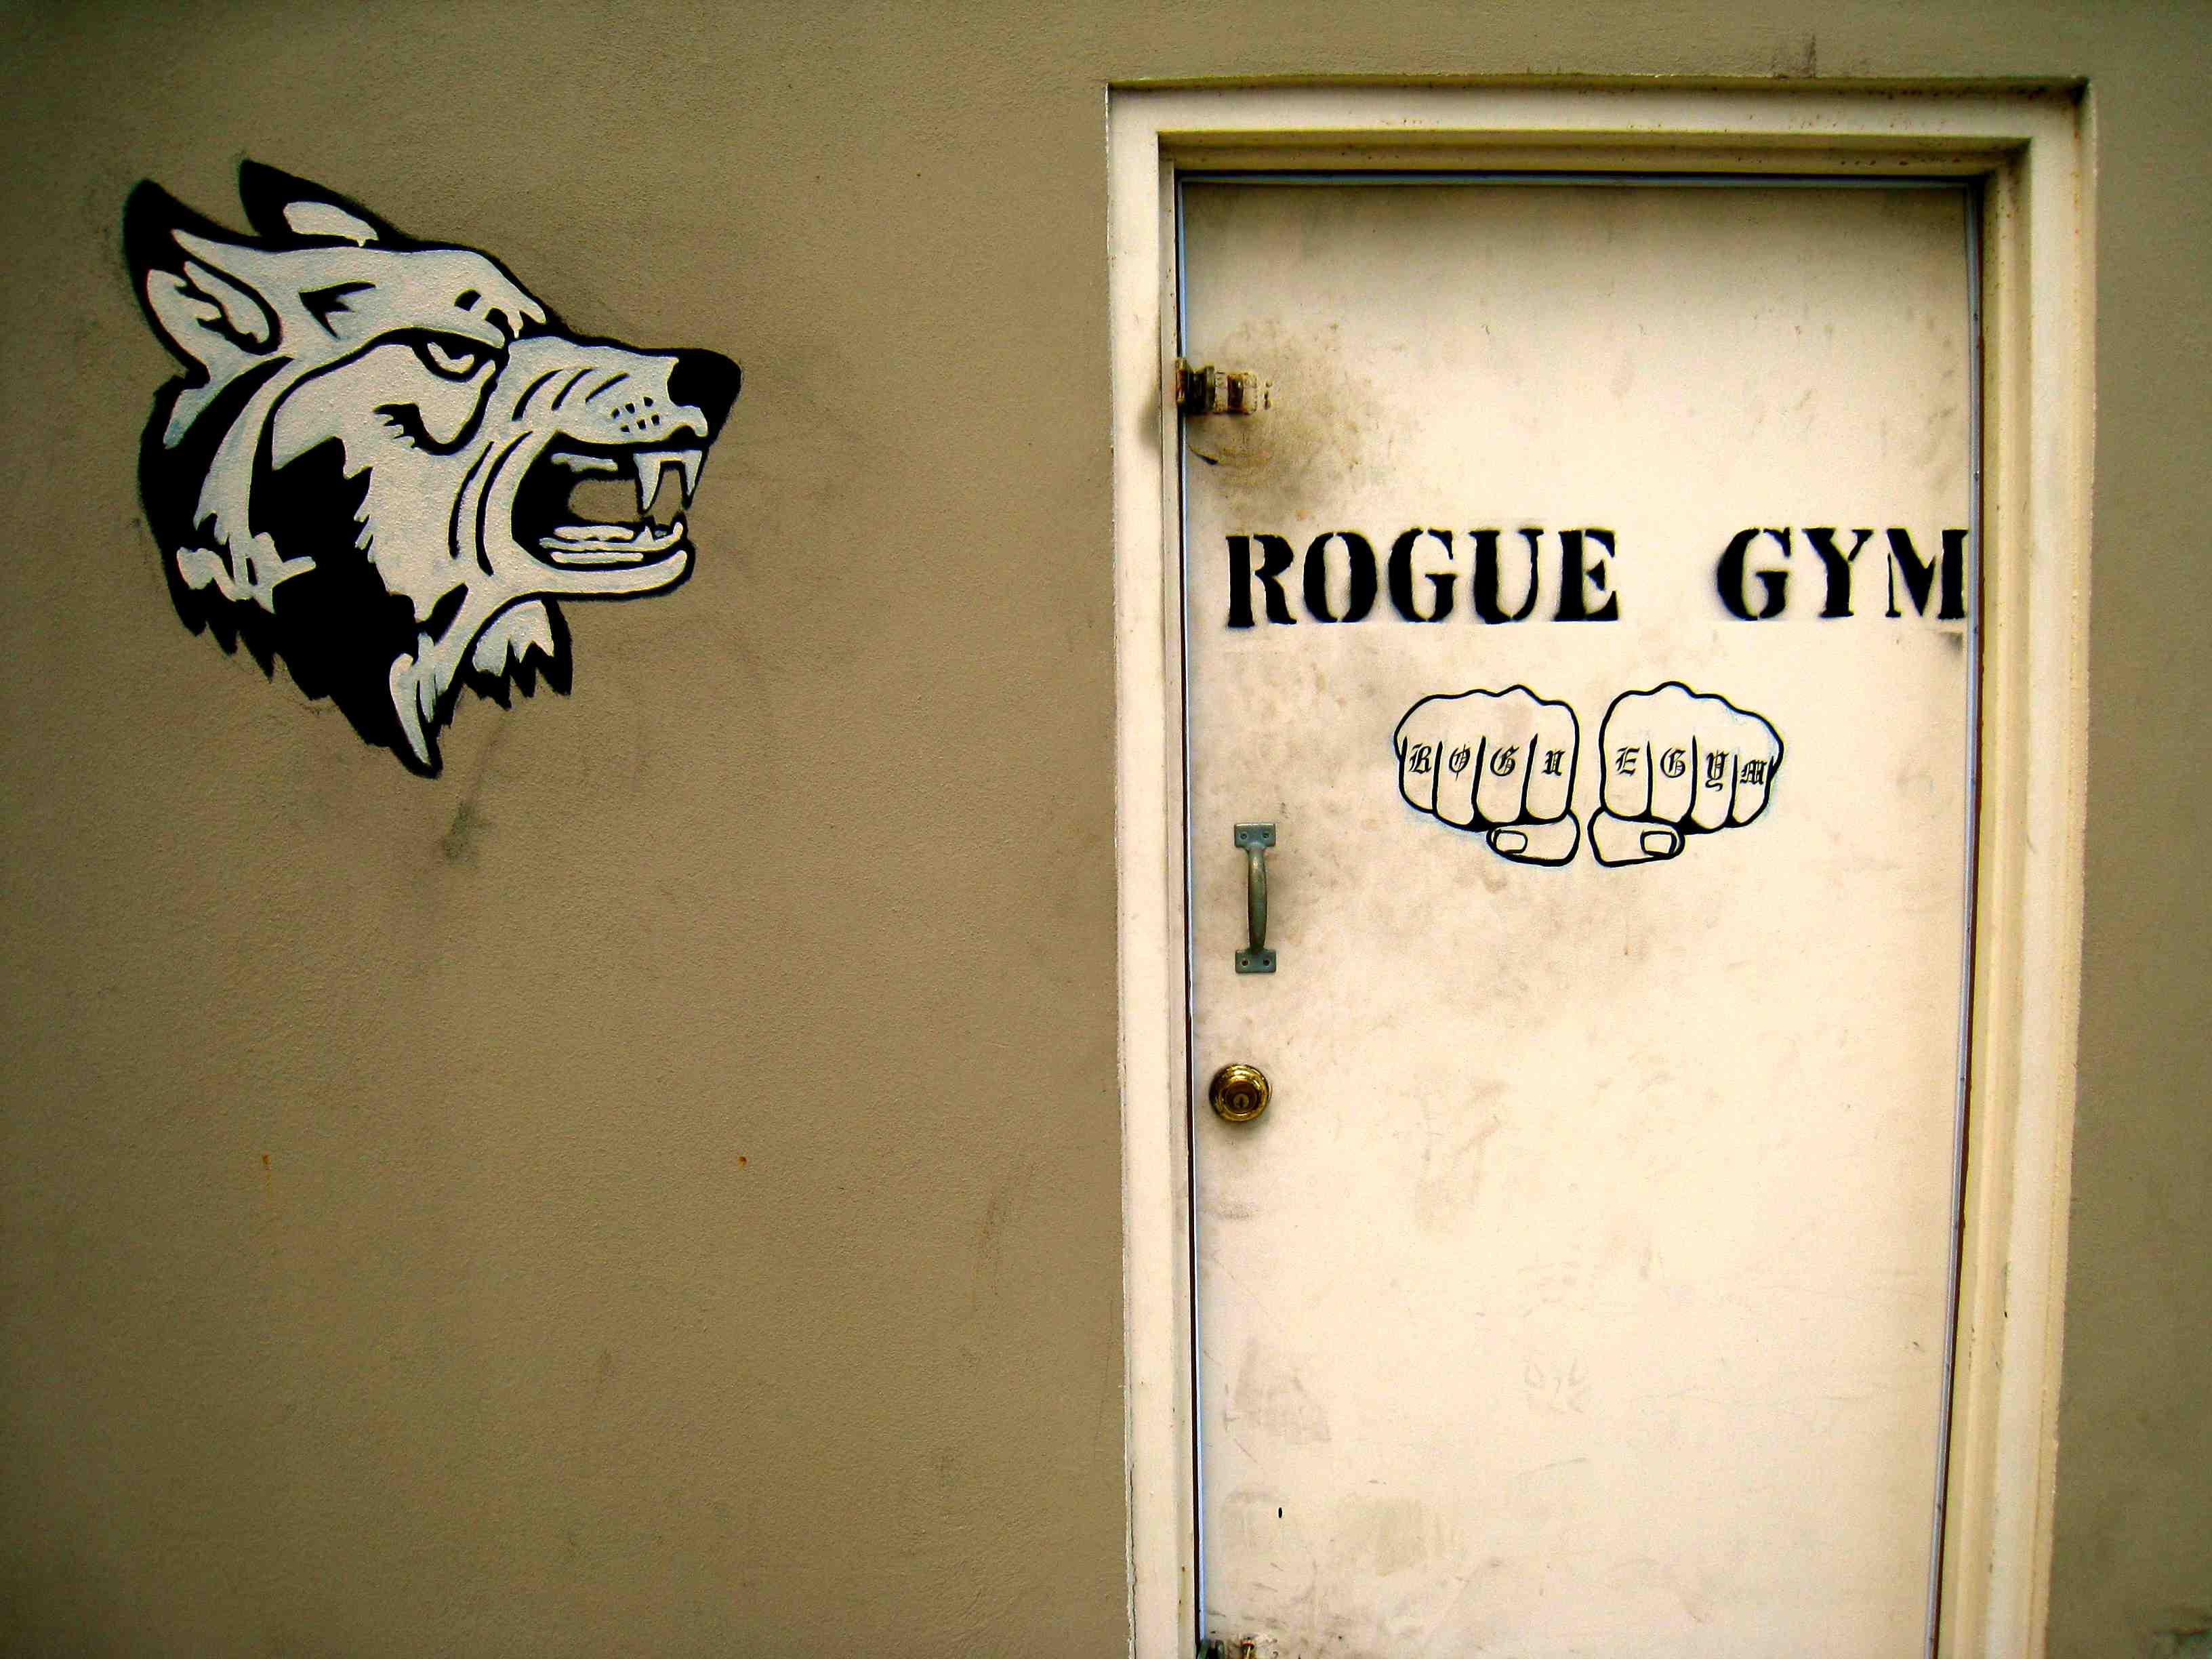 Rogue Gym in Grand Cayman, Cayman Islands - EcayOnline